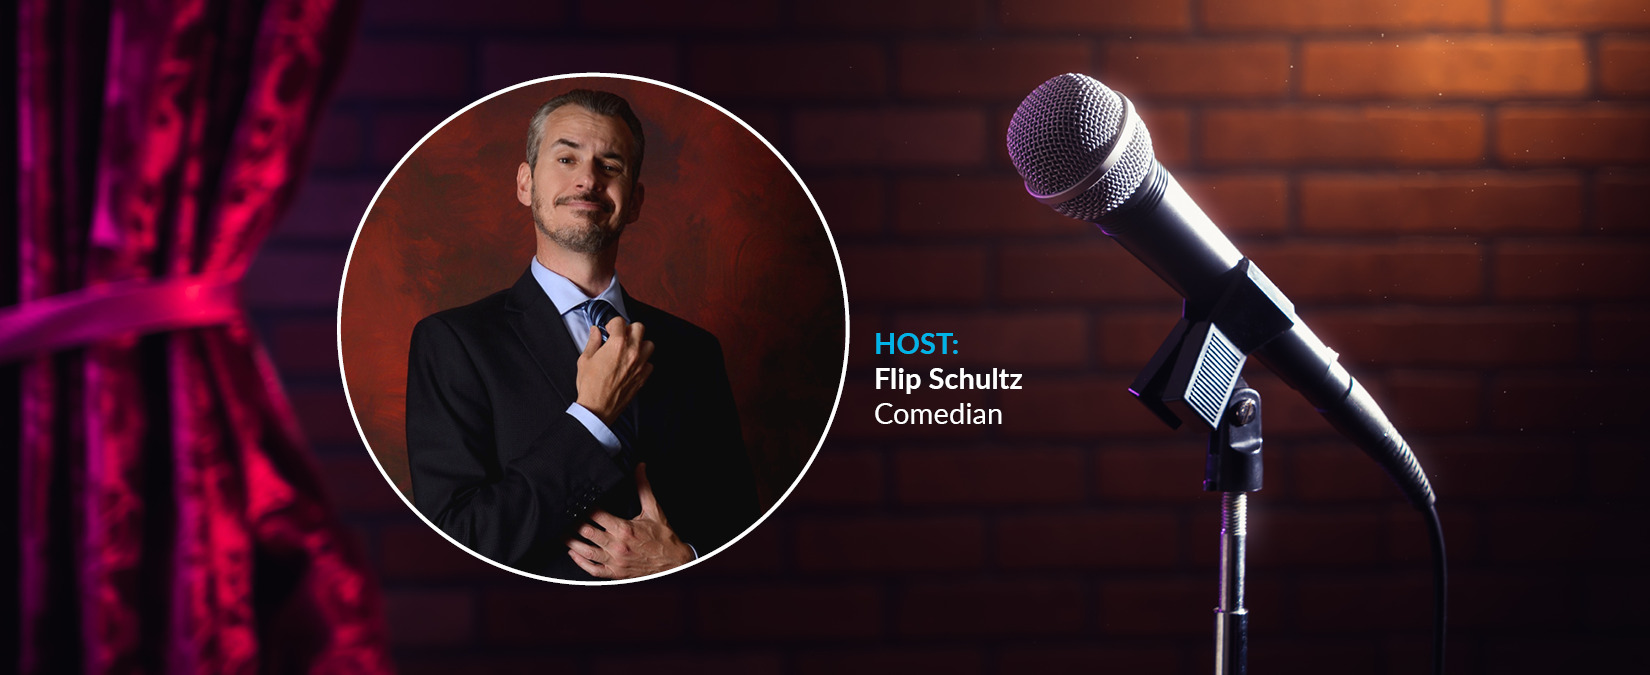 Comedy Hour with Flip Schultz